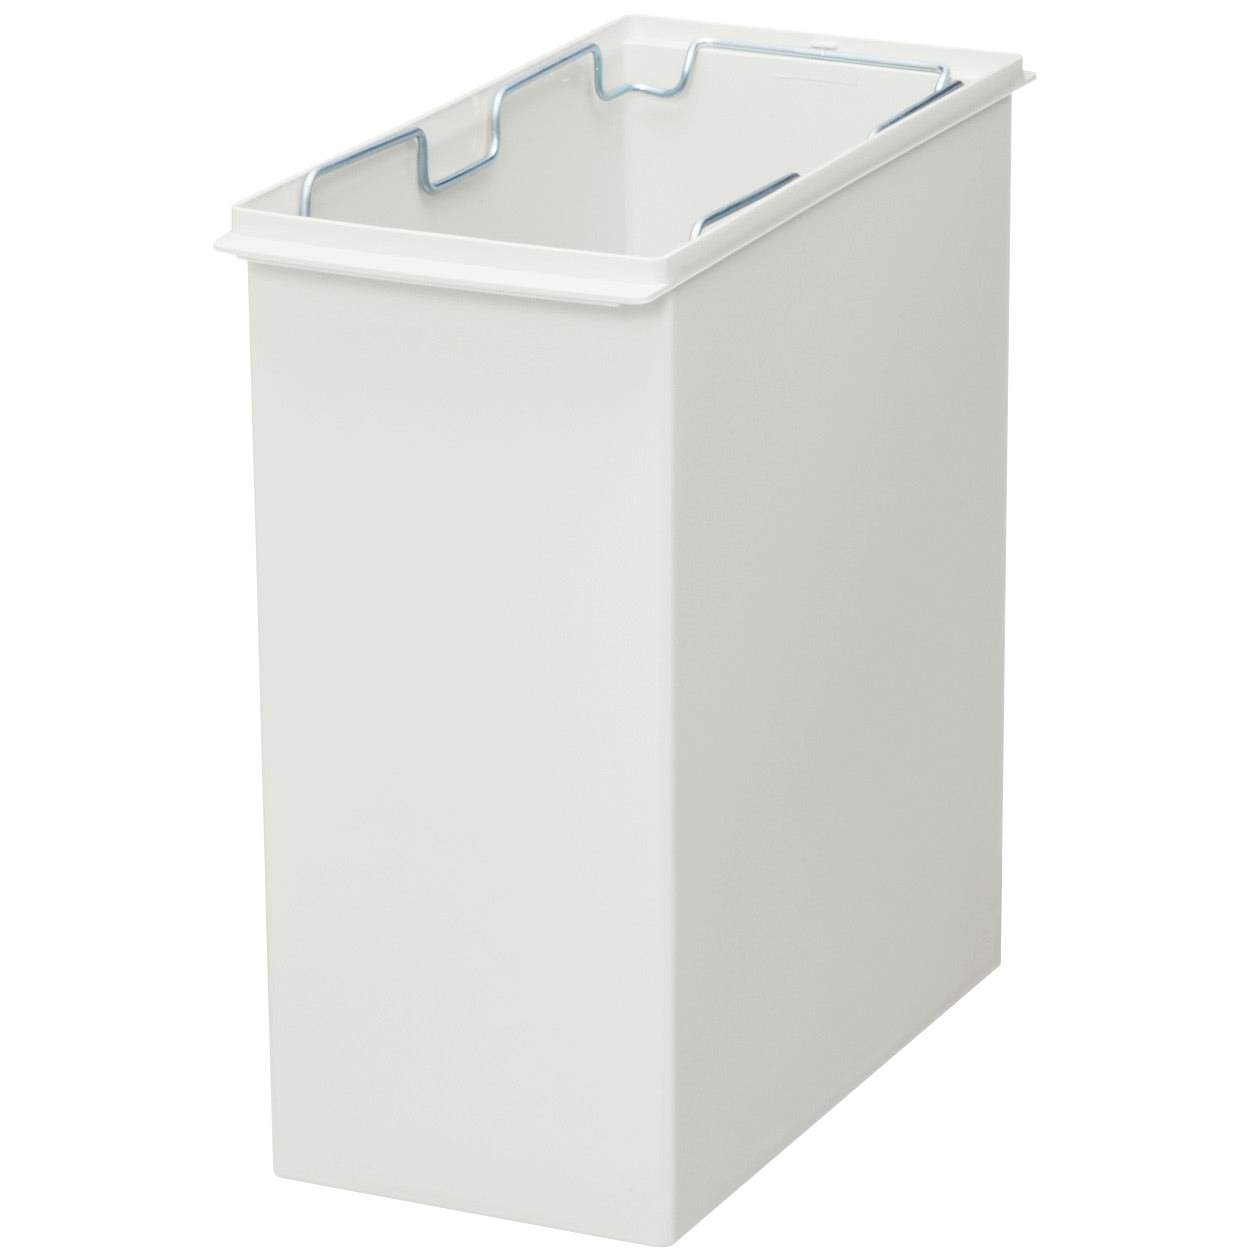 PP垃圾筒 | 無印良品 MUJI